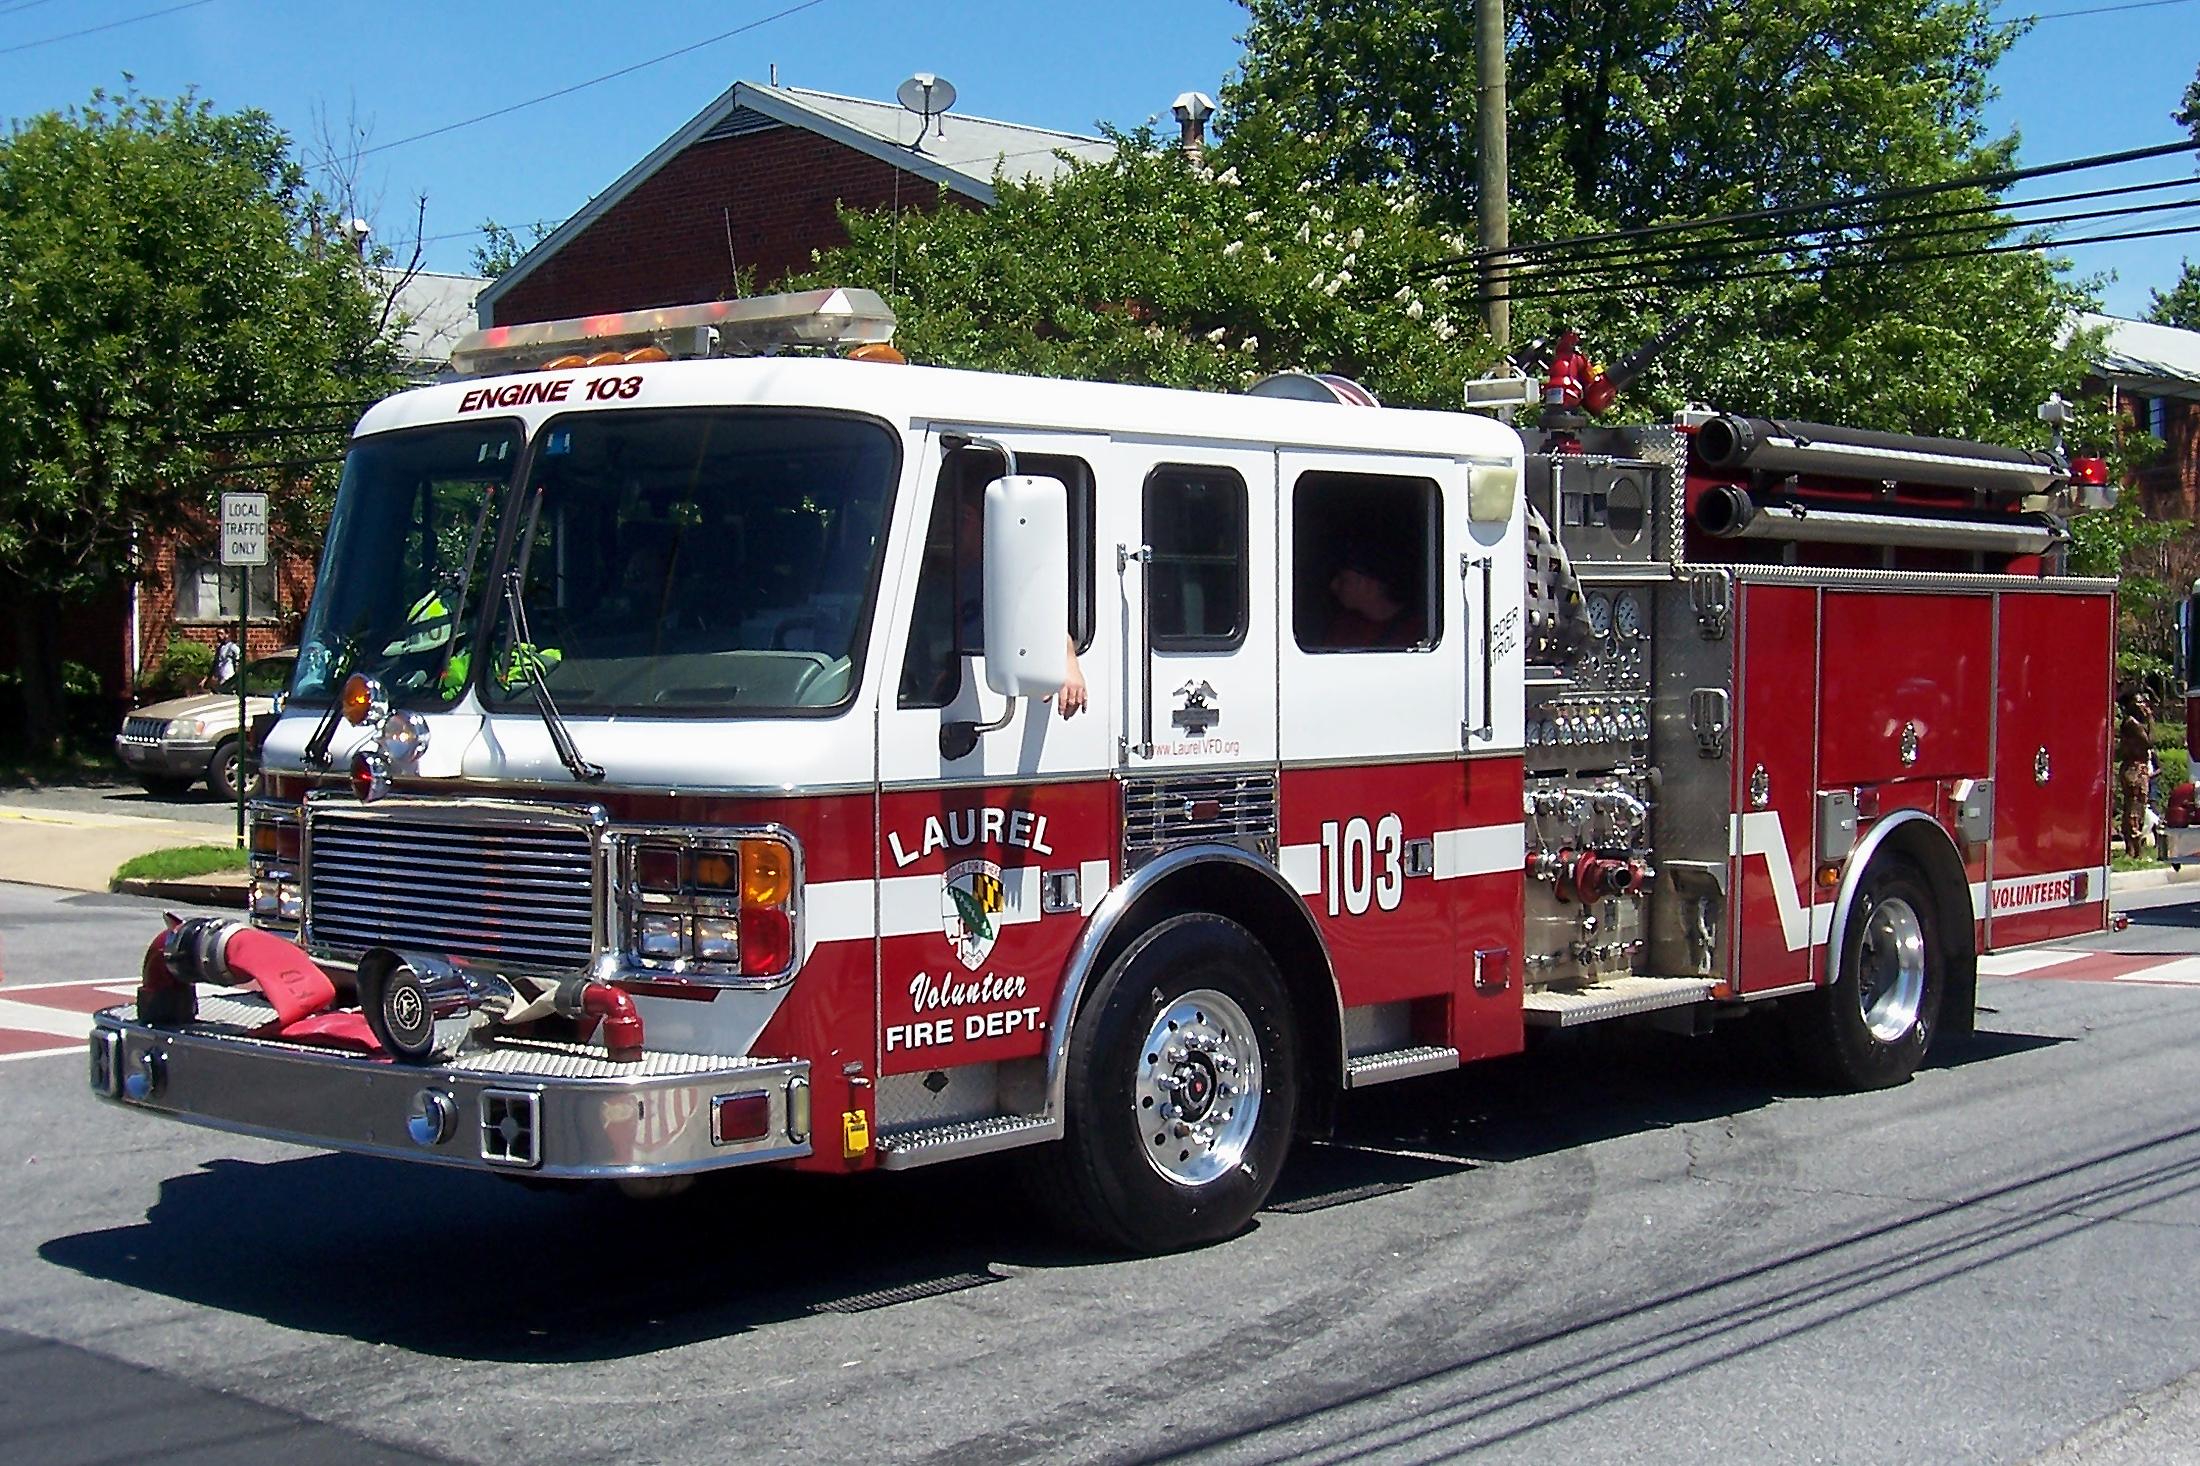 Laurel fire engine